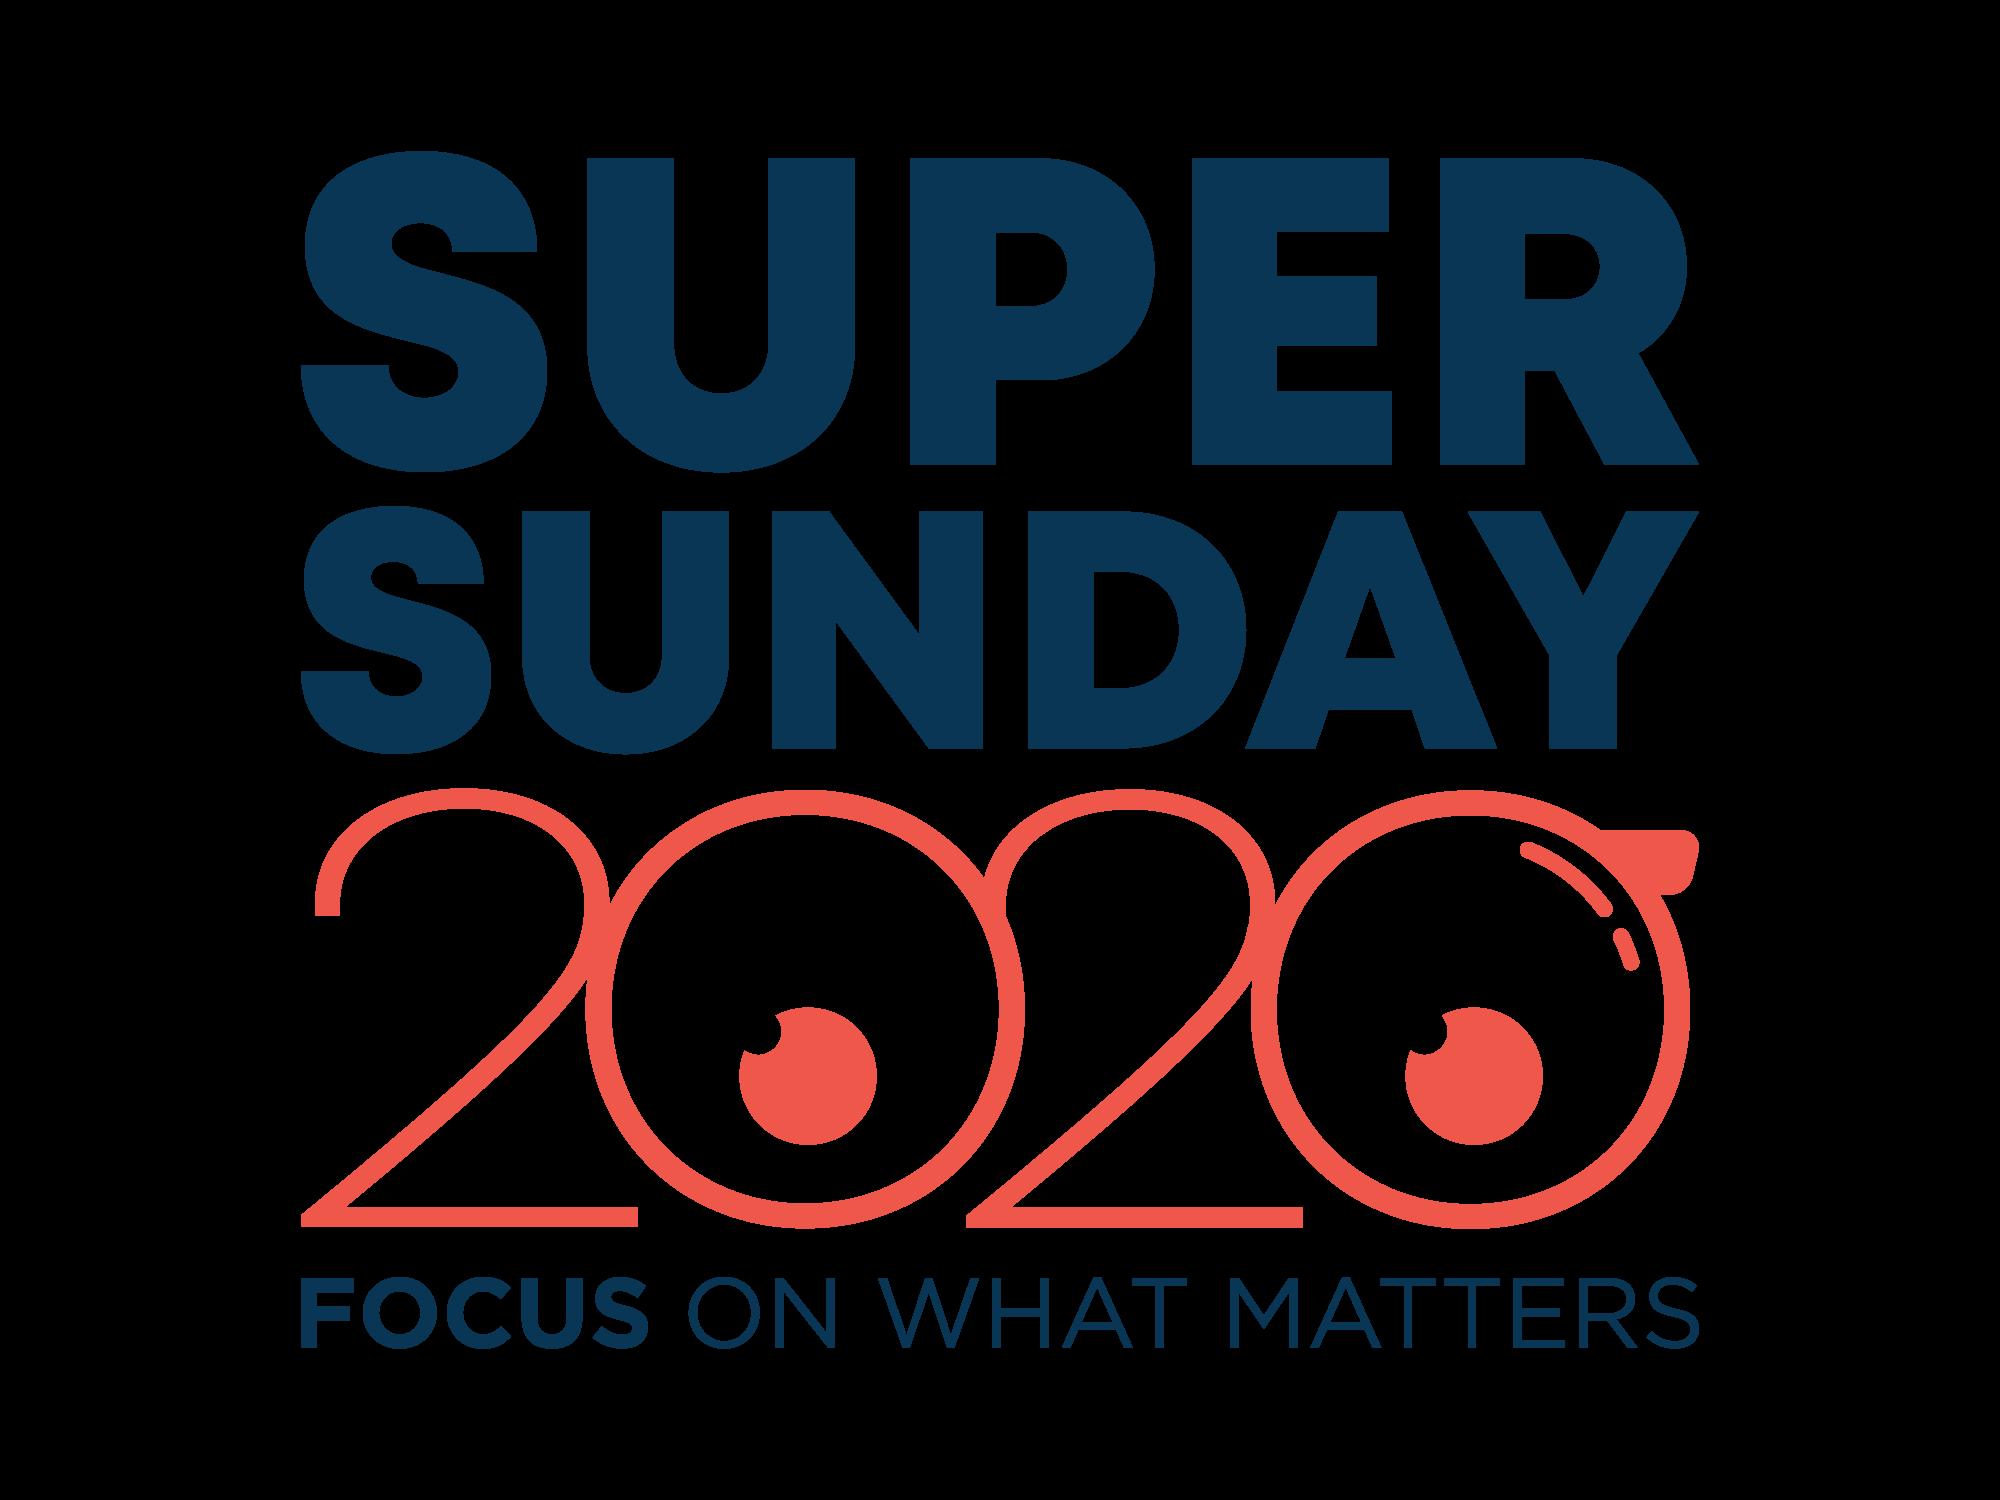 Super.sunday.2020.brlogo %28002%29